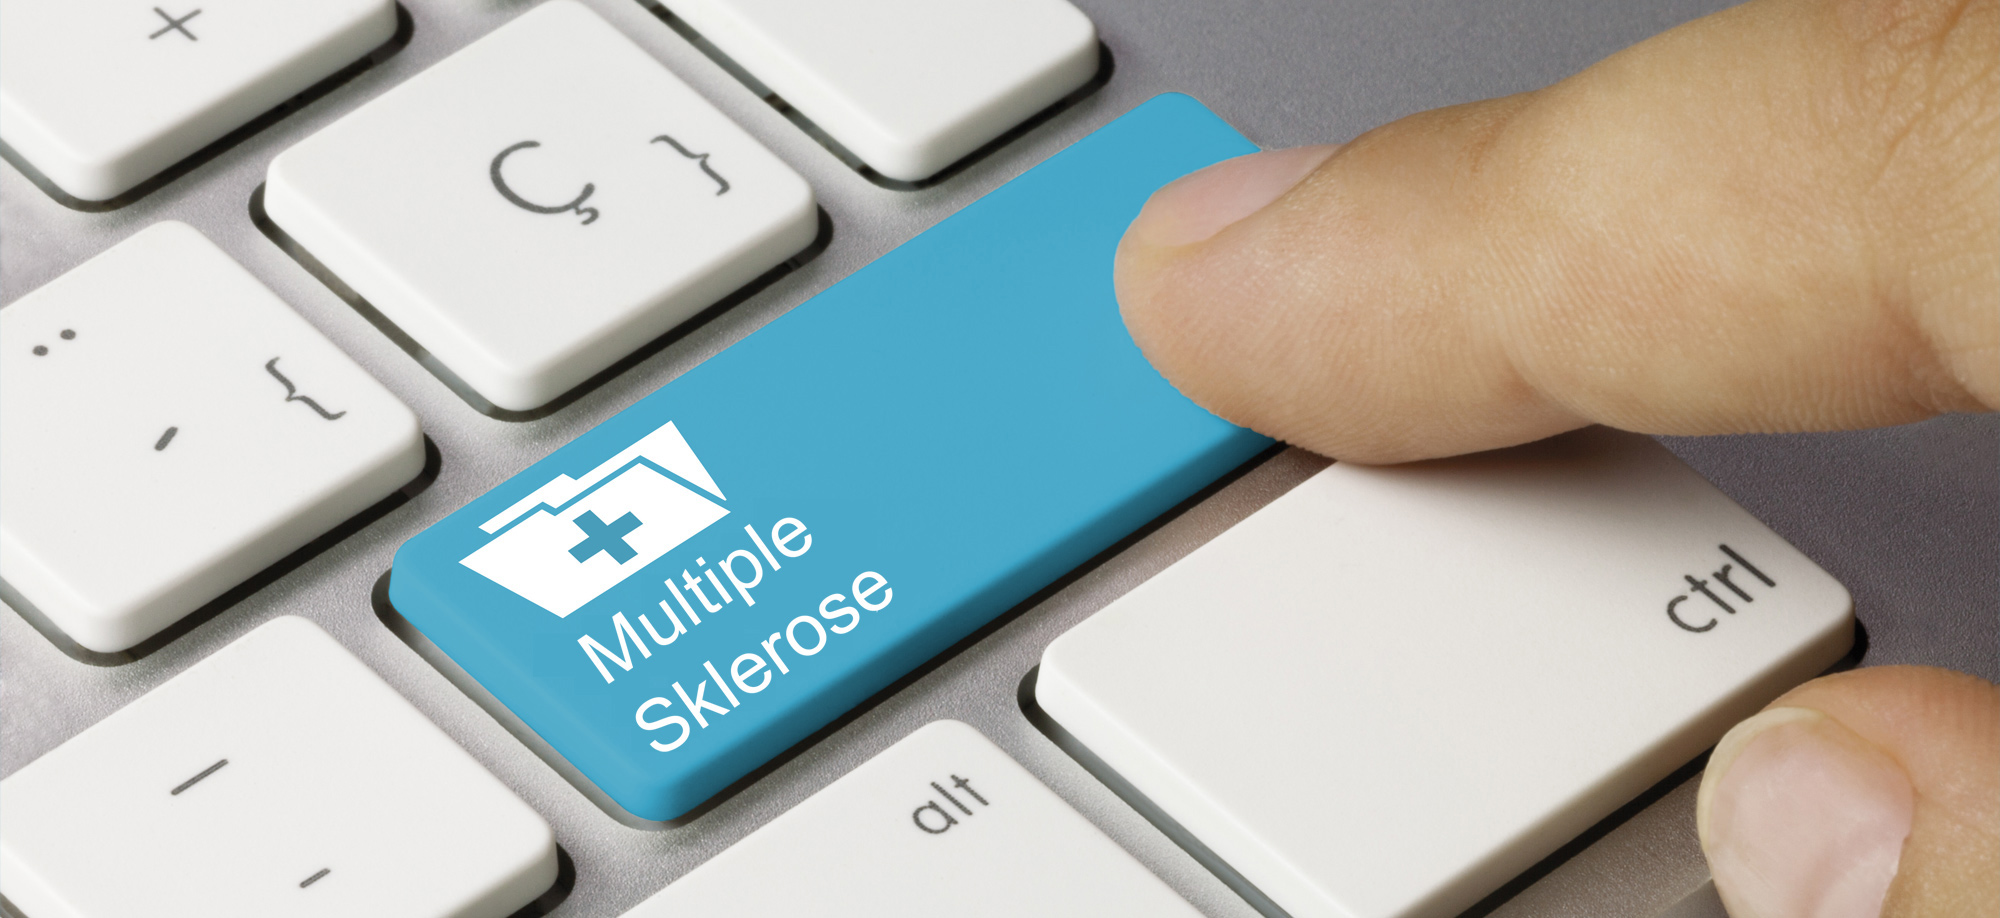 "PC-Tastatur, Enter-Taste mit Schriftzug ""Multiple Sklerose"" belegt, Credit: © momius, Adobe Stock"